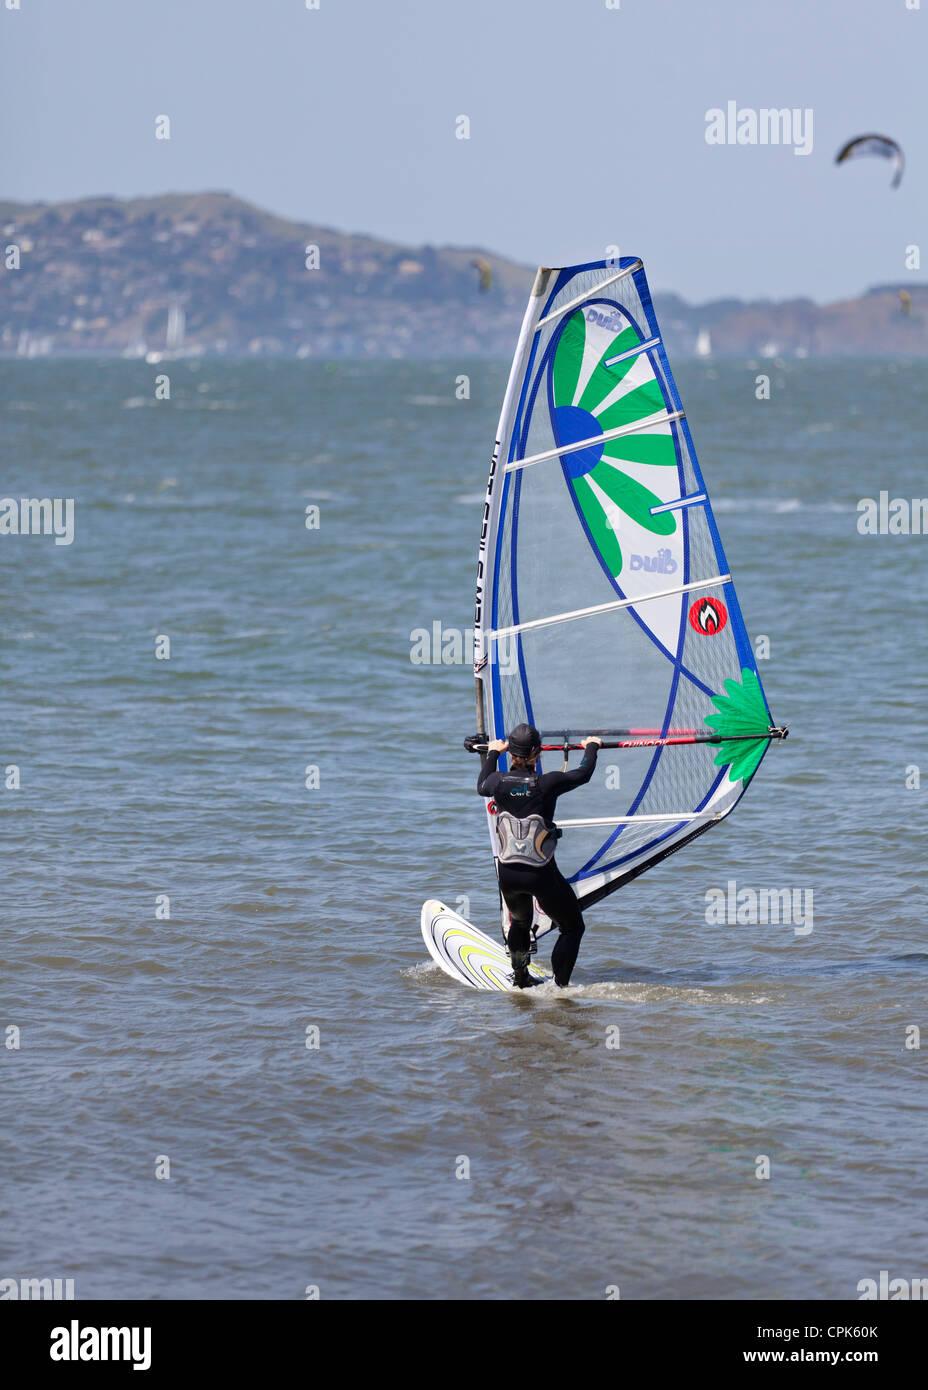 Windsurfer on the water - San Francisco, California USA - Stock Image